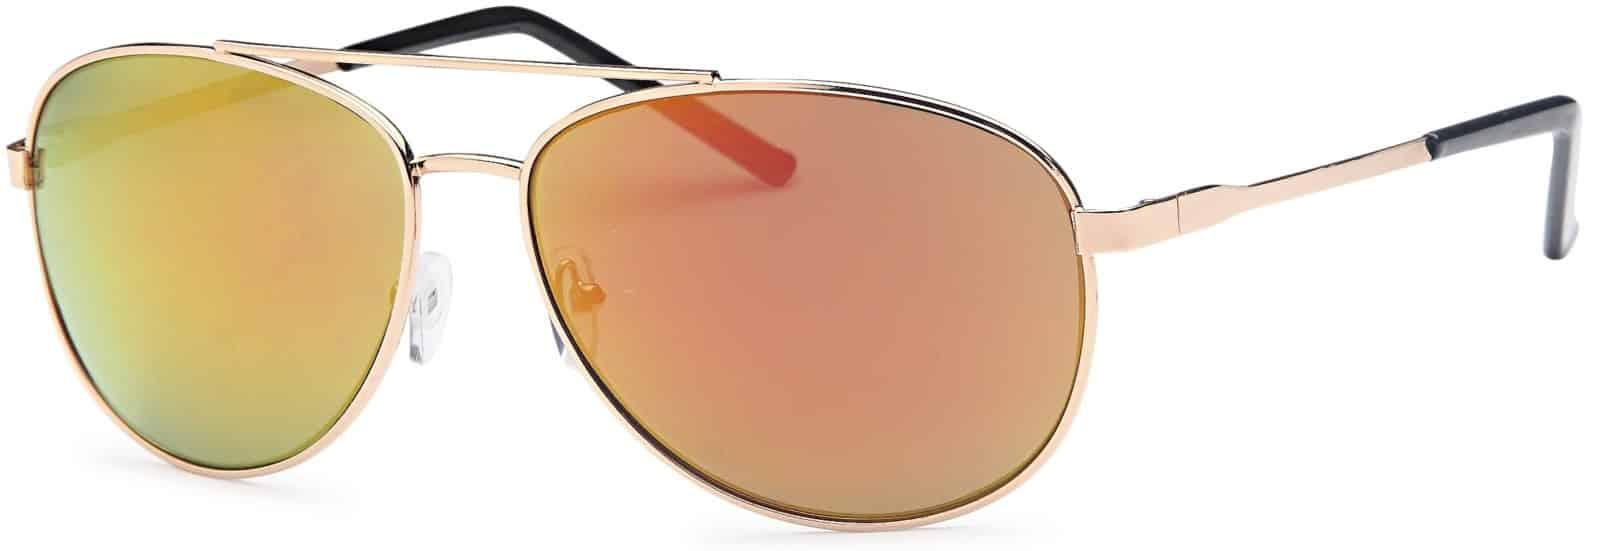 women pilot sunglasses